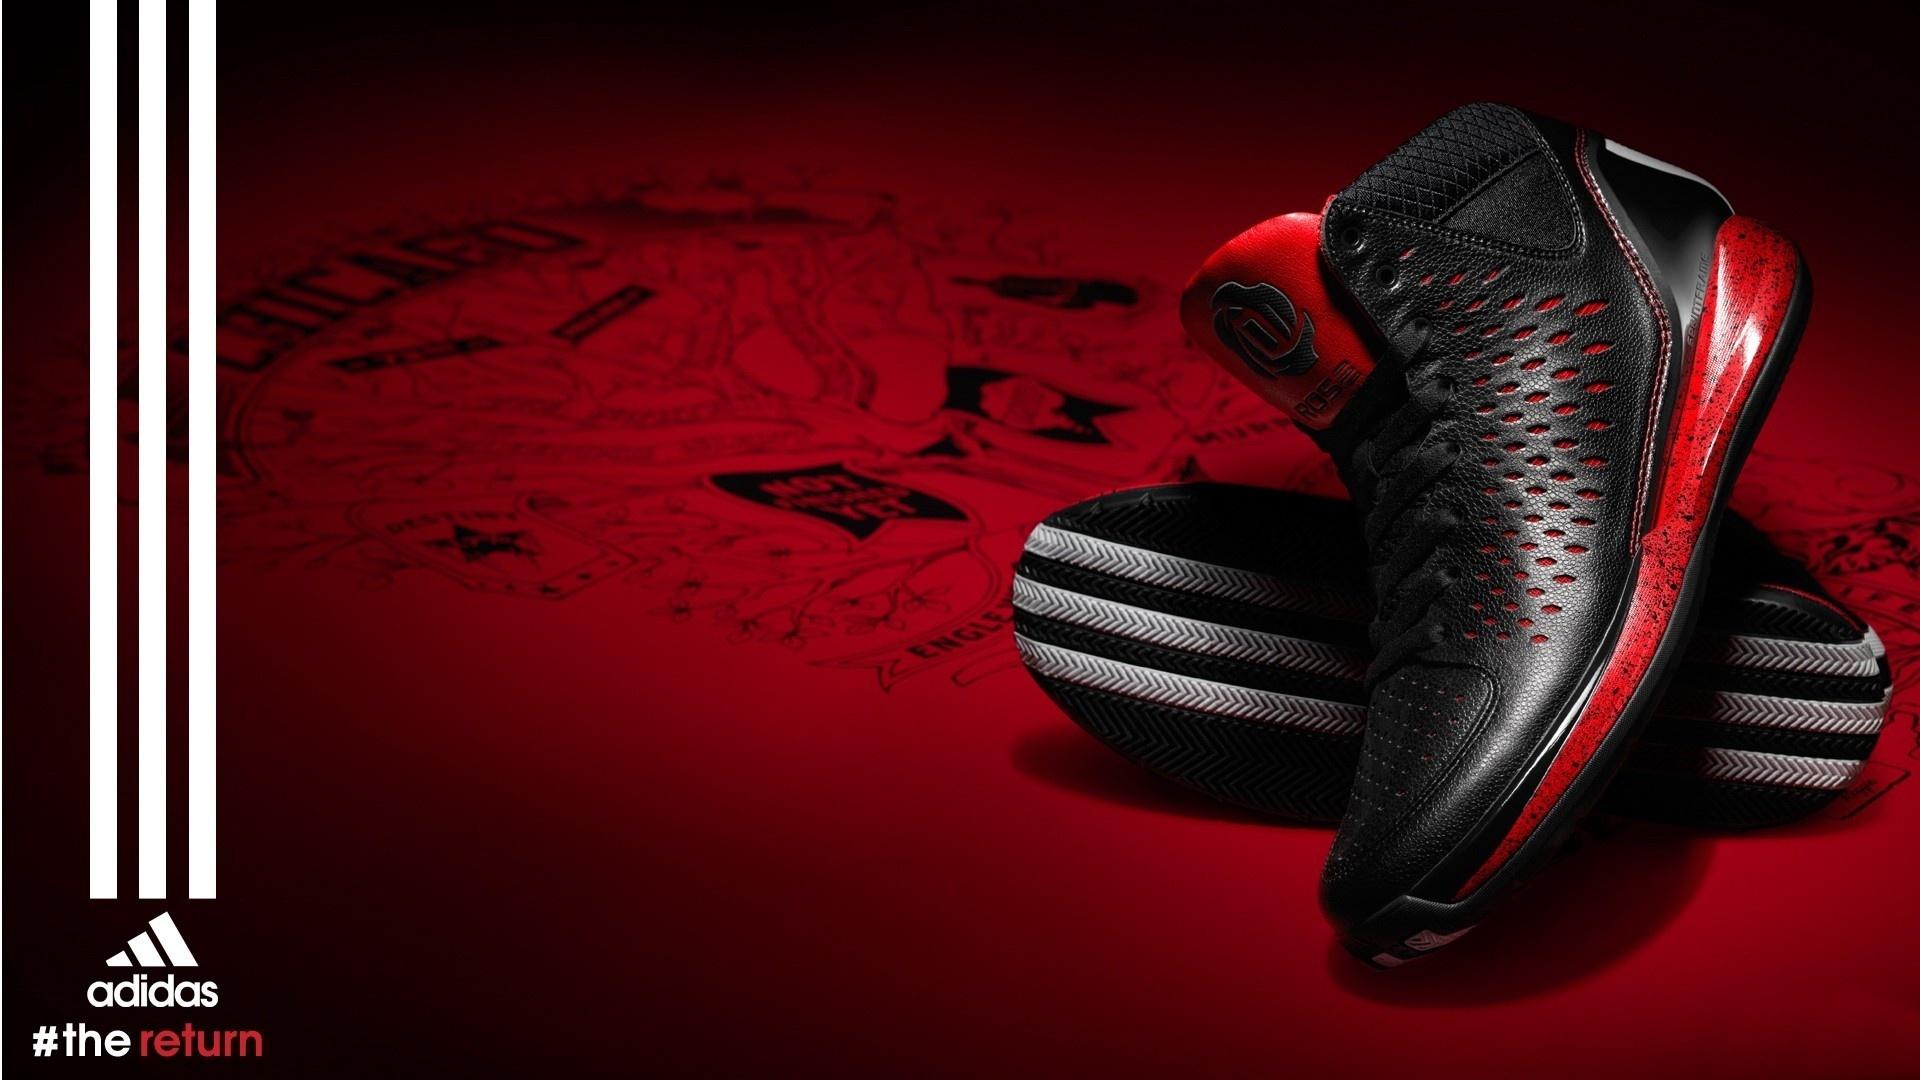 Derrick Rose Wallpaper Quotes Adidas Shoes Wallpapers Pixelstalk Net